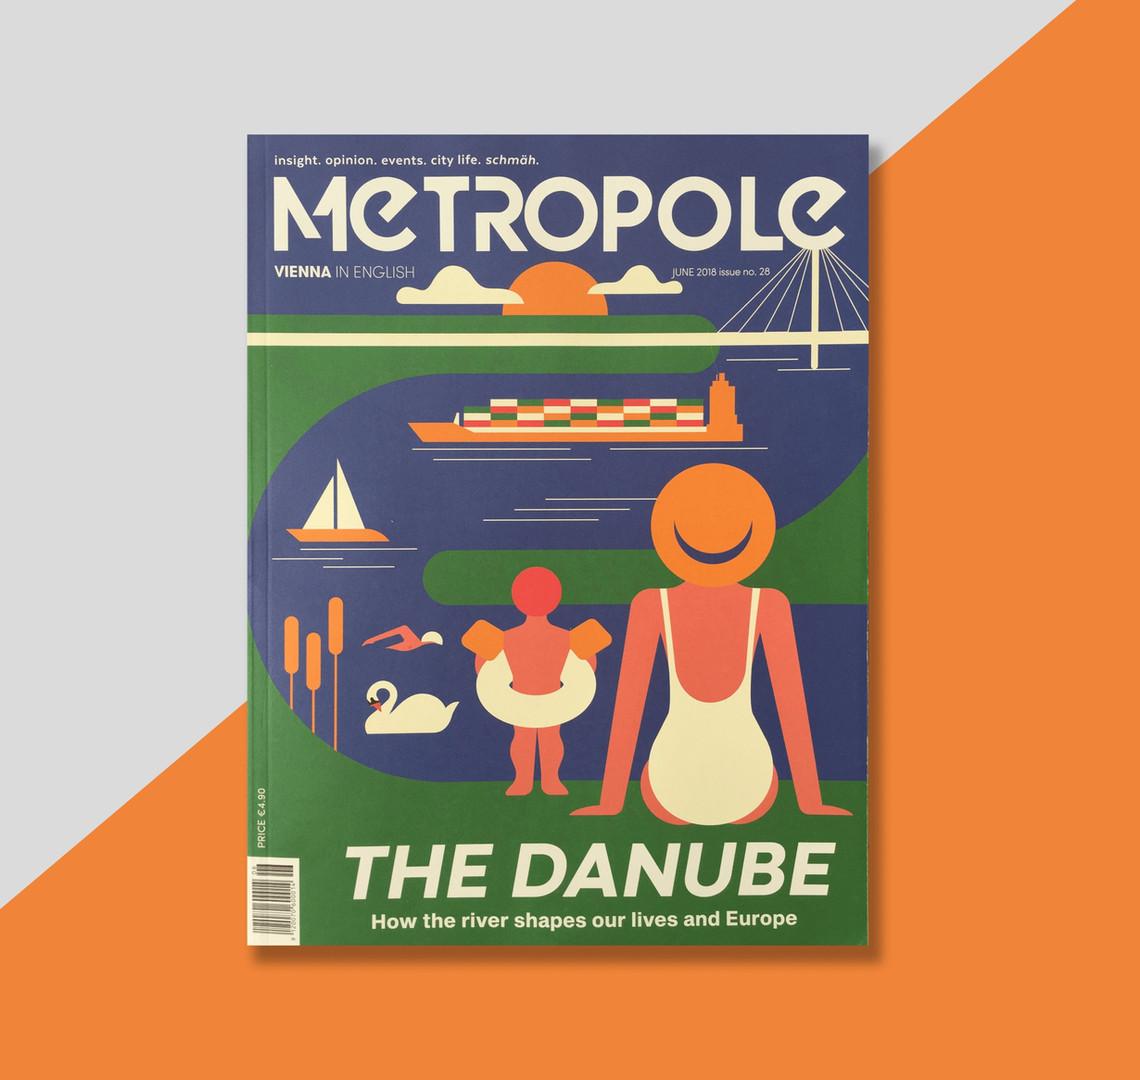 Metropole%20Danube_edited.jpg